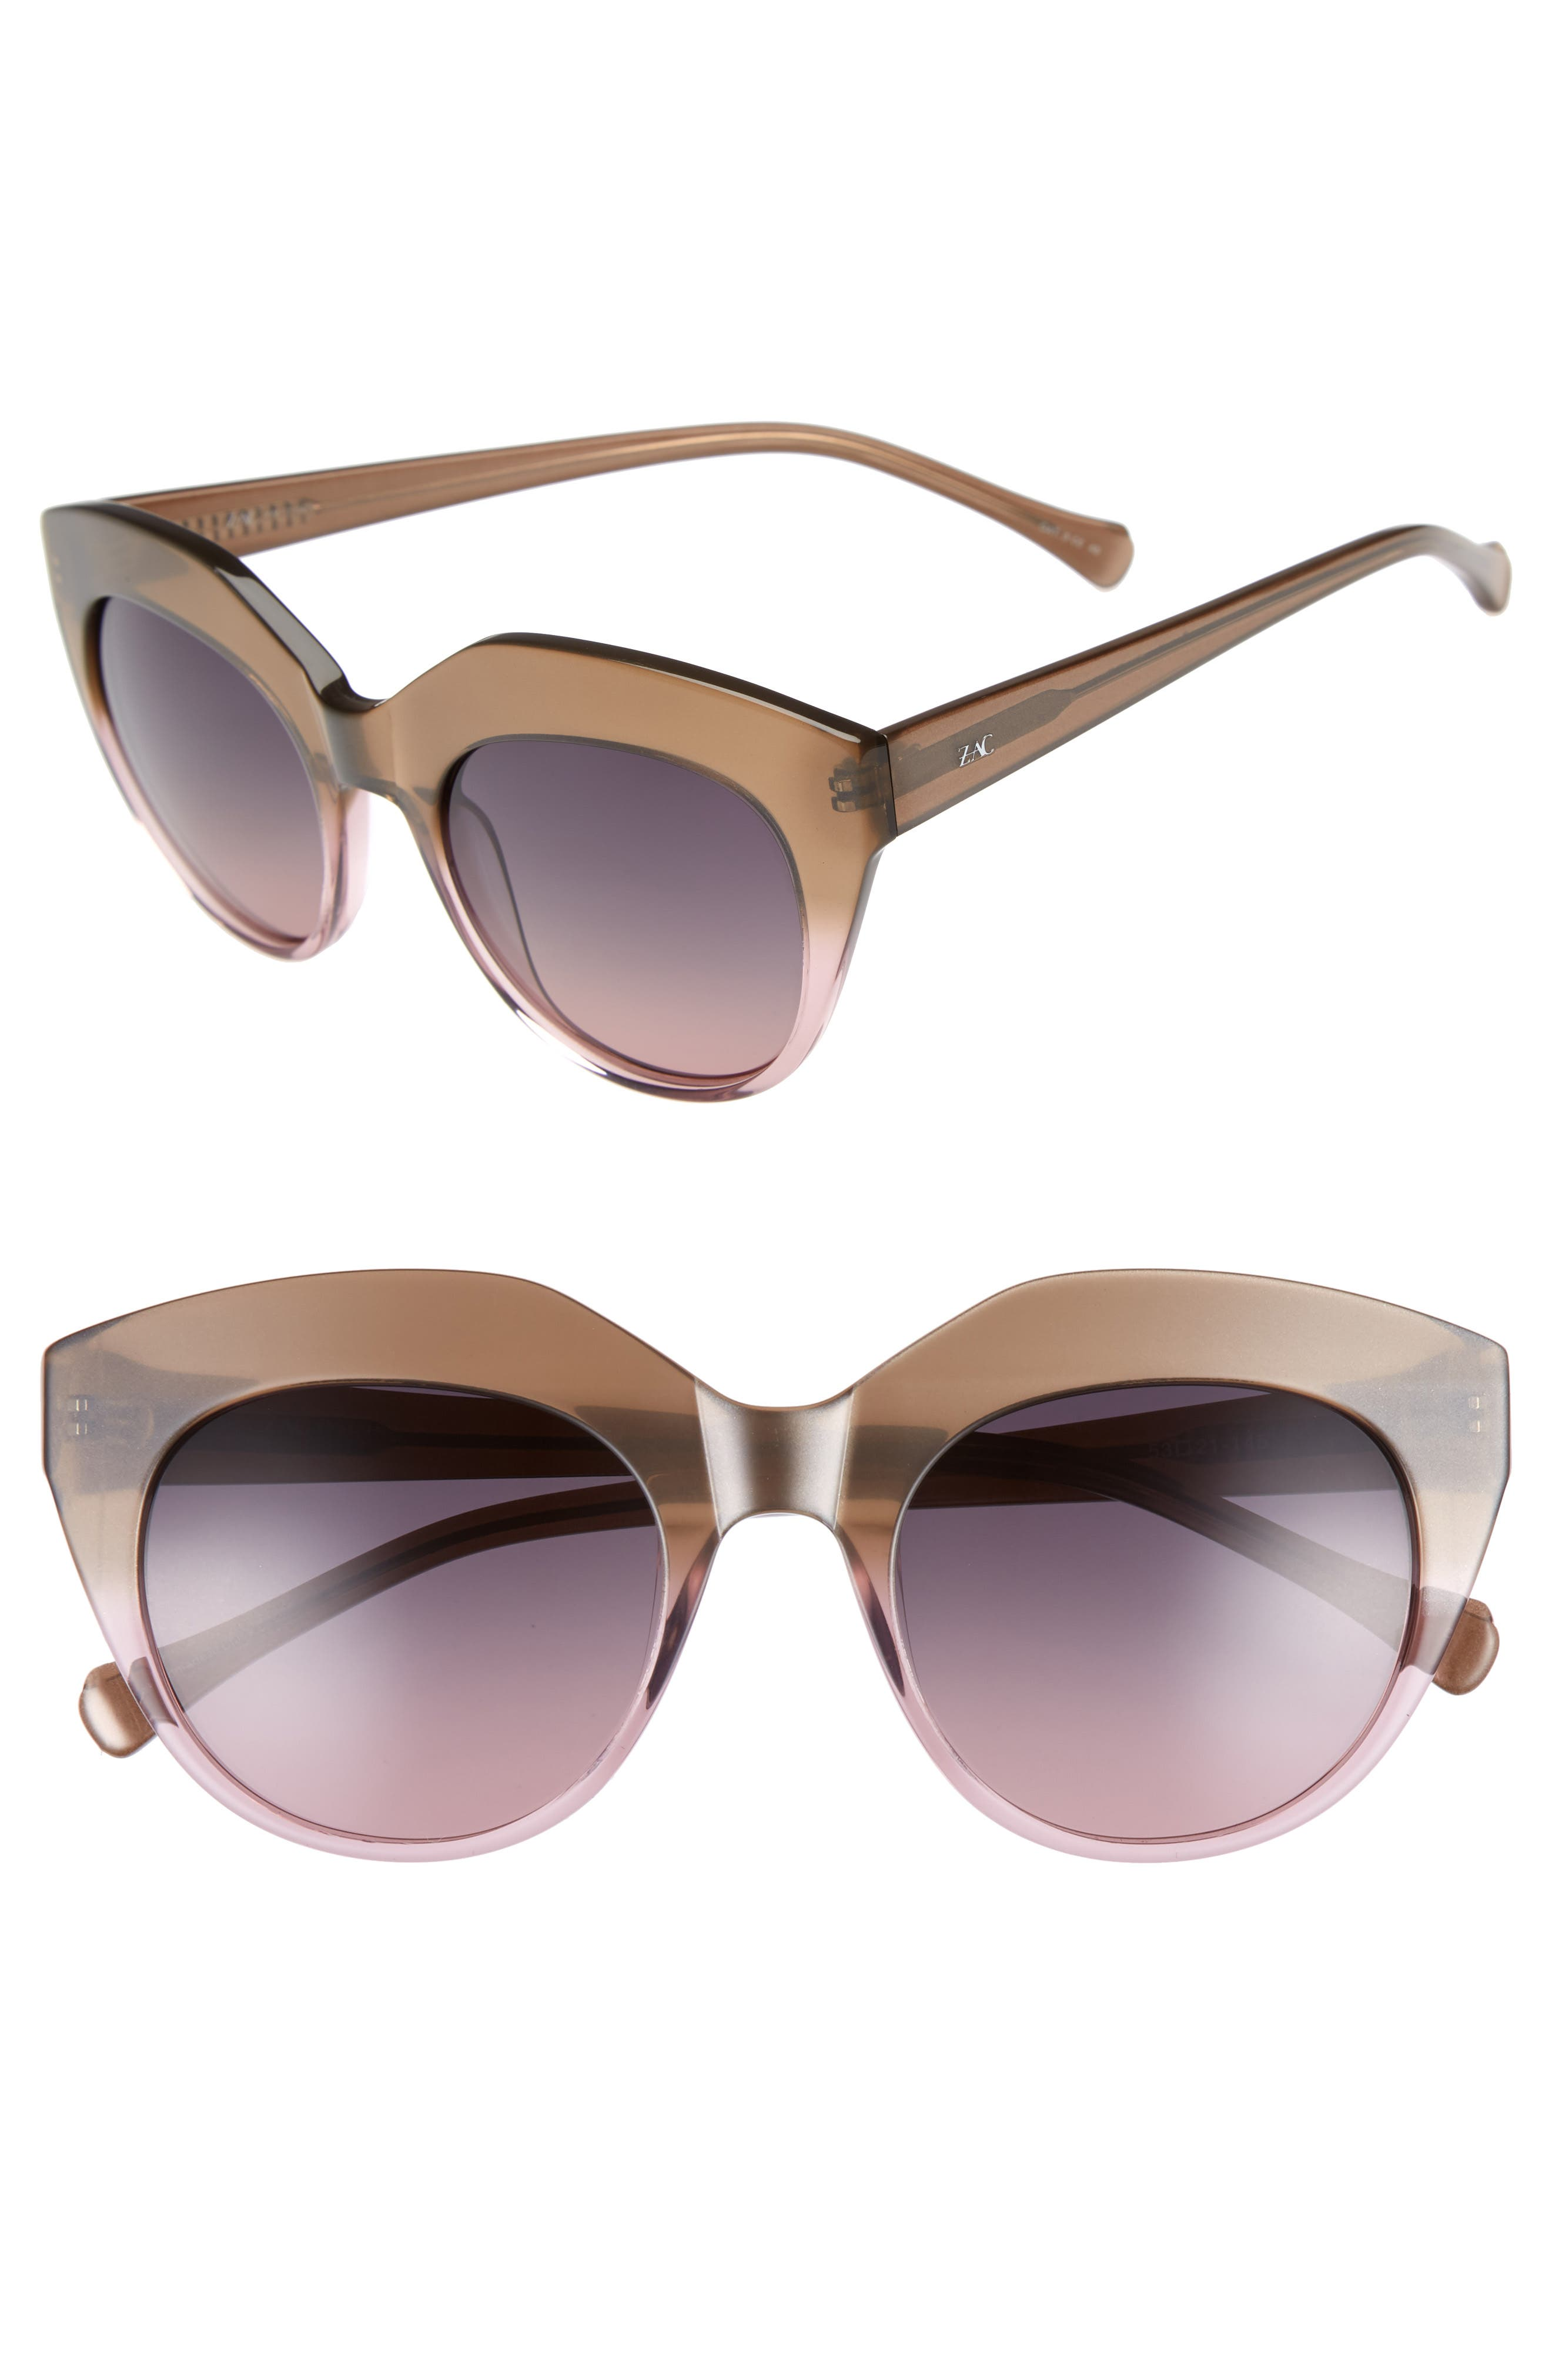 Tamika 53mm Polarized Sunglasses,                             Main thumbnail 1, color,                             Dessert/ Berry